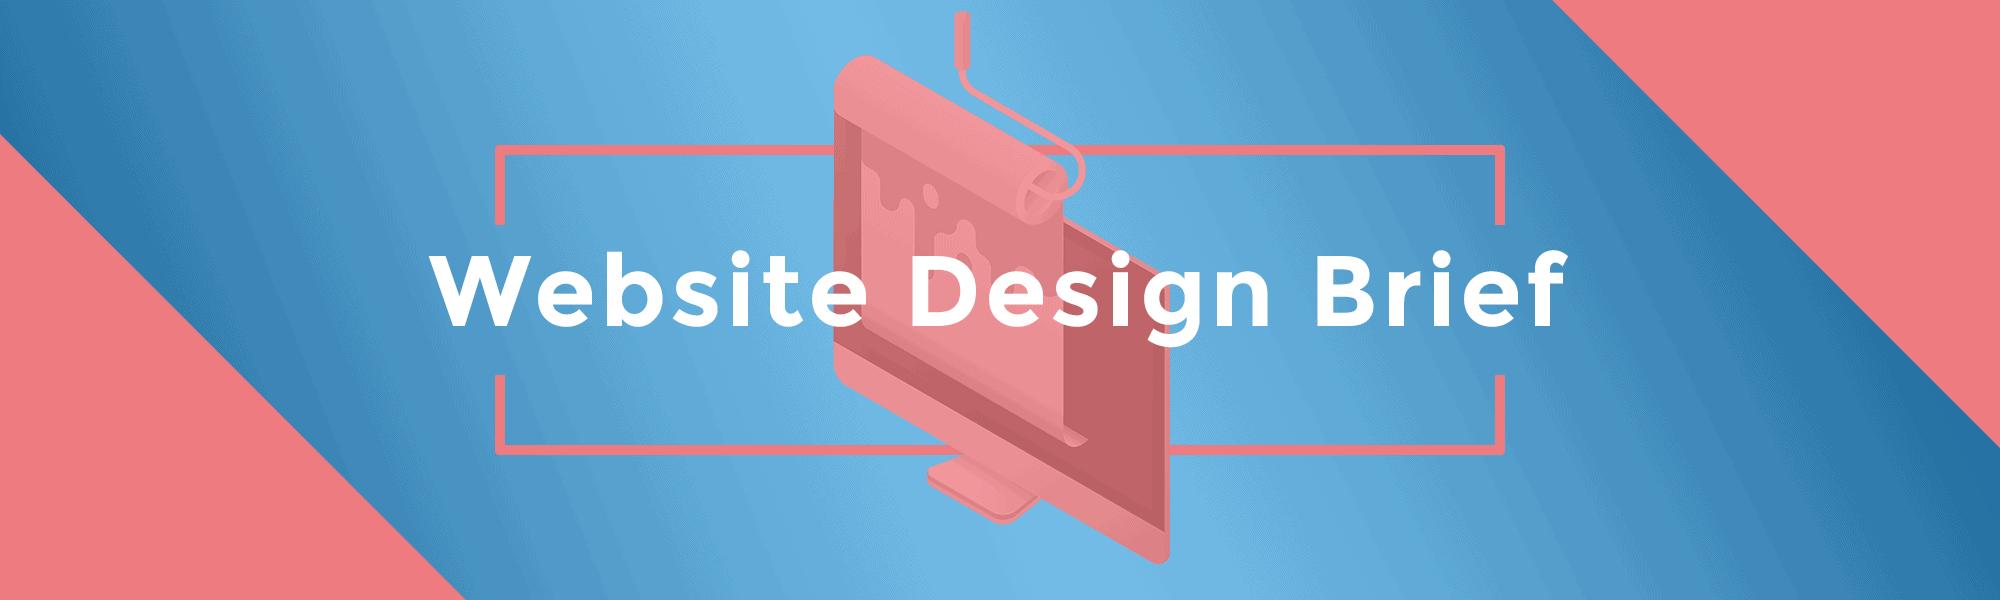 M2F Banners_WebsiteDesignBrief